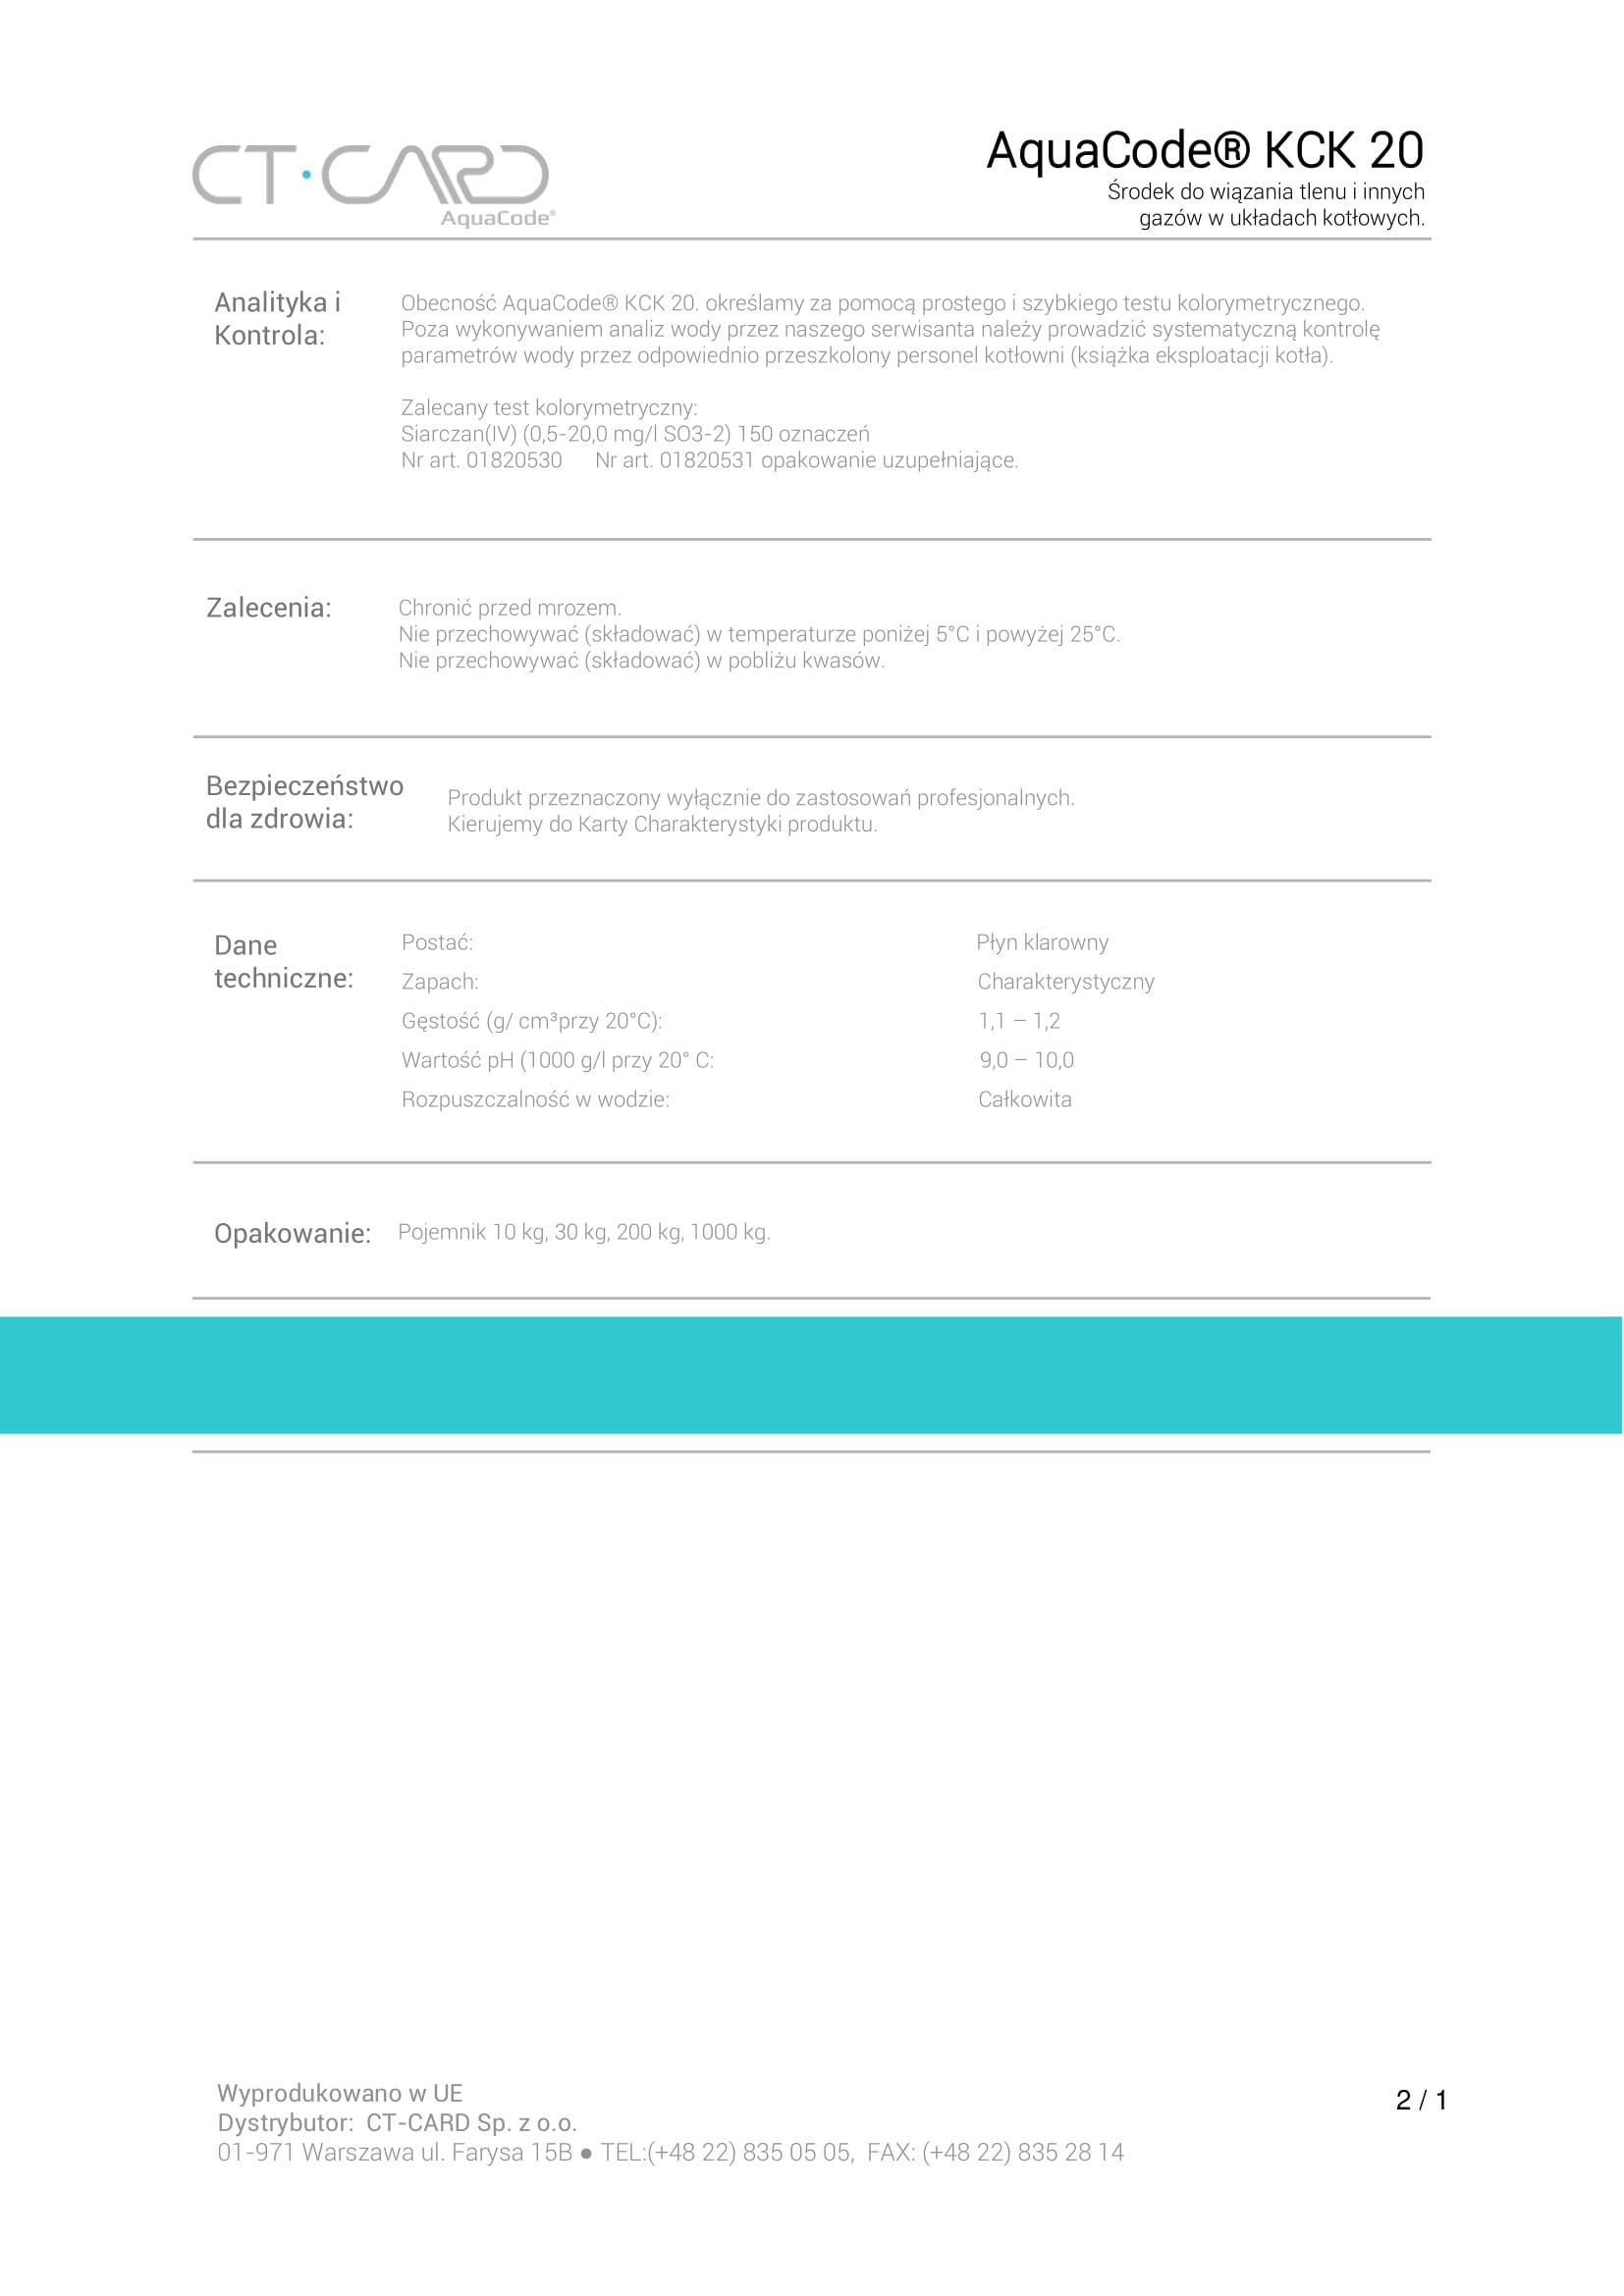 AquaCode_KCK_20-2